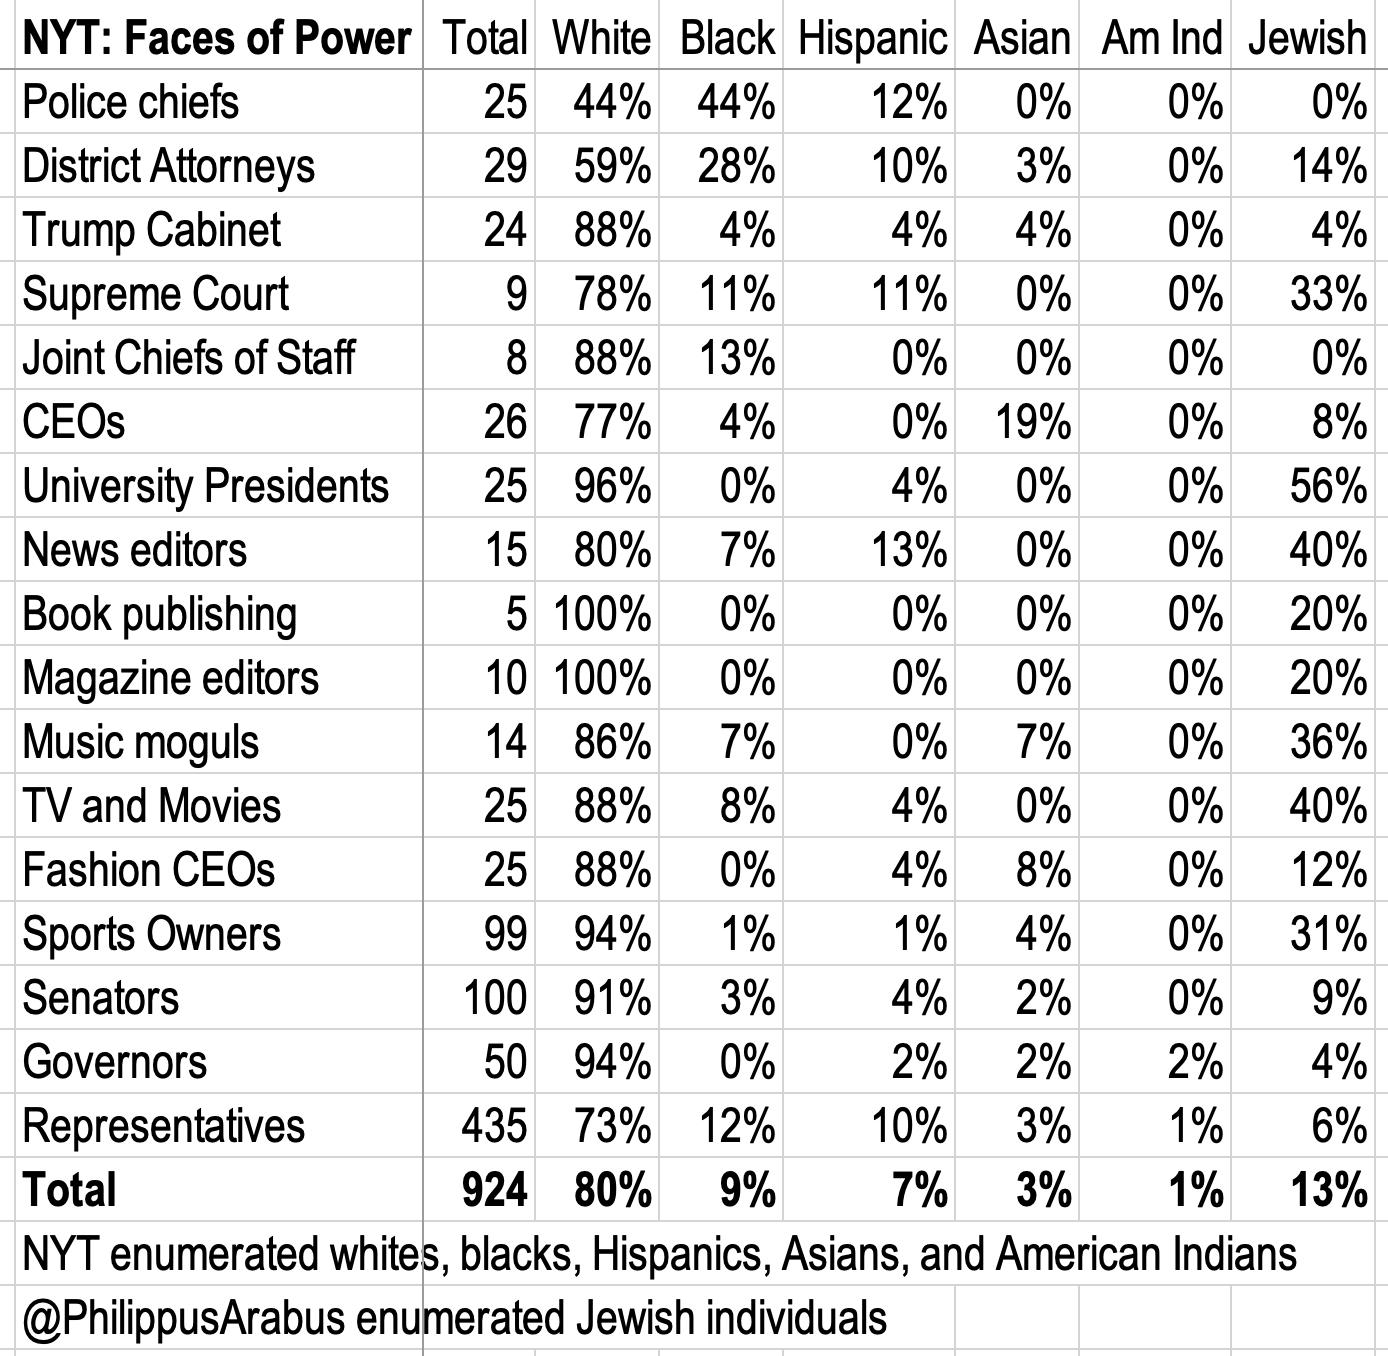 The illusion of white power